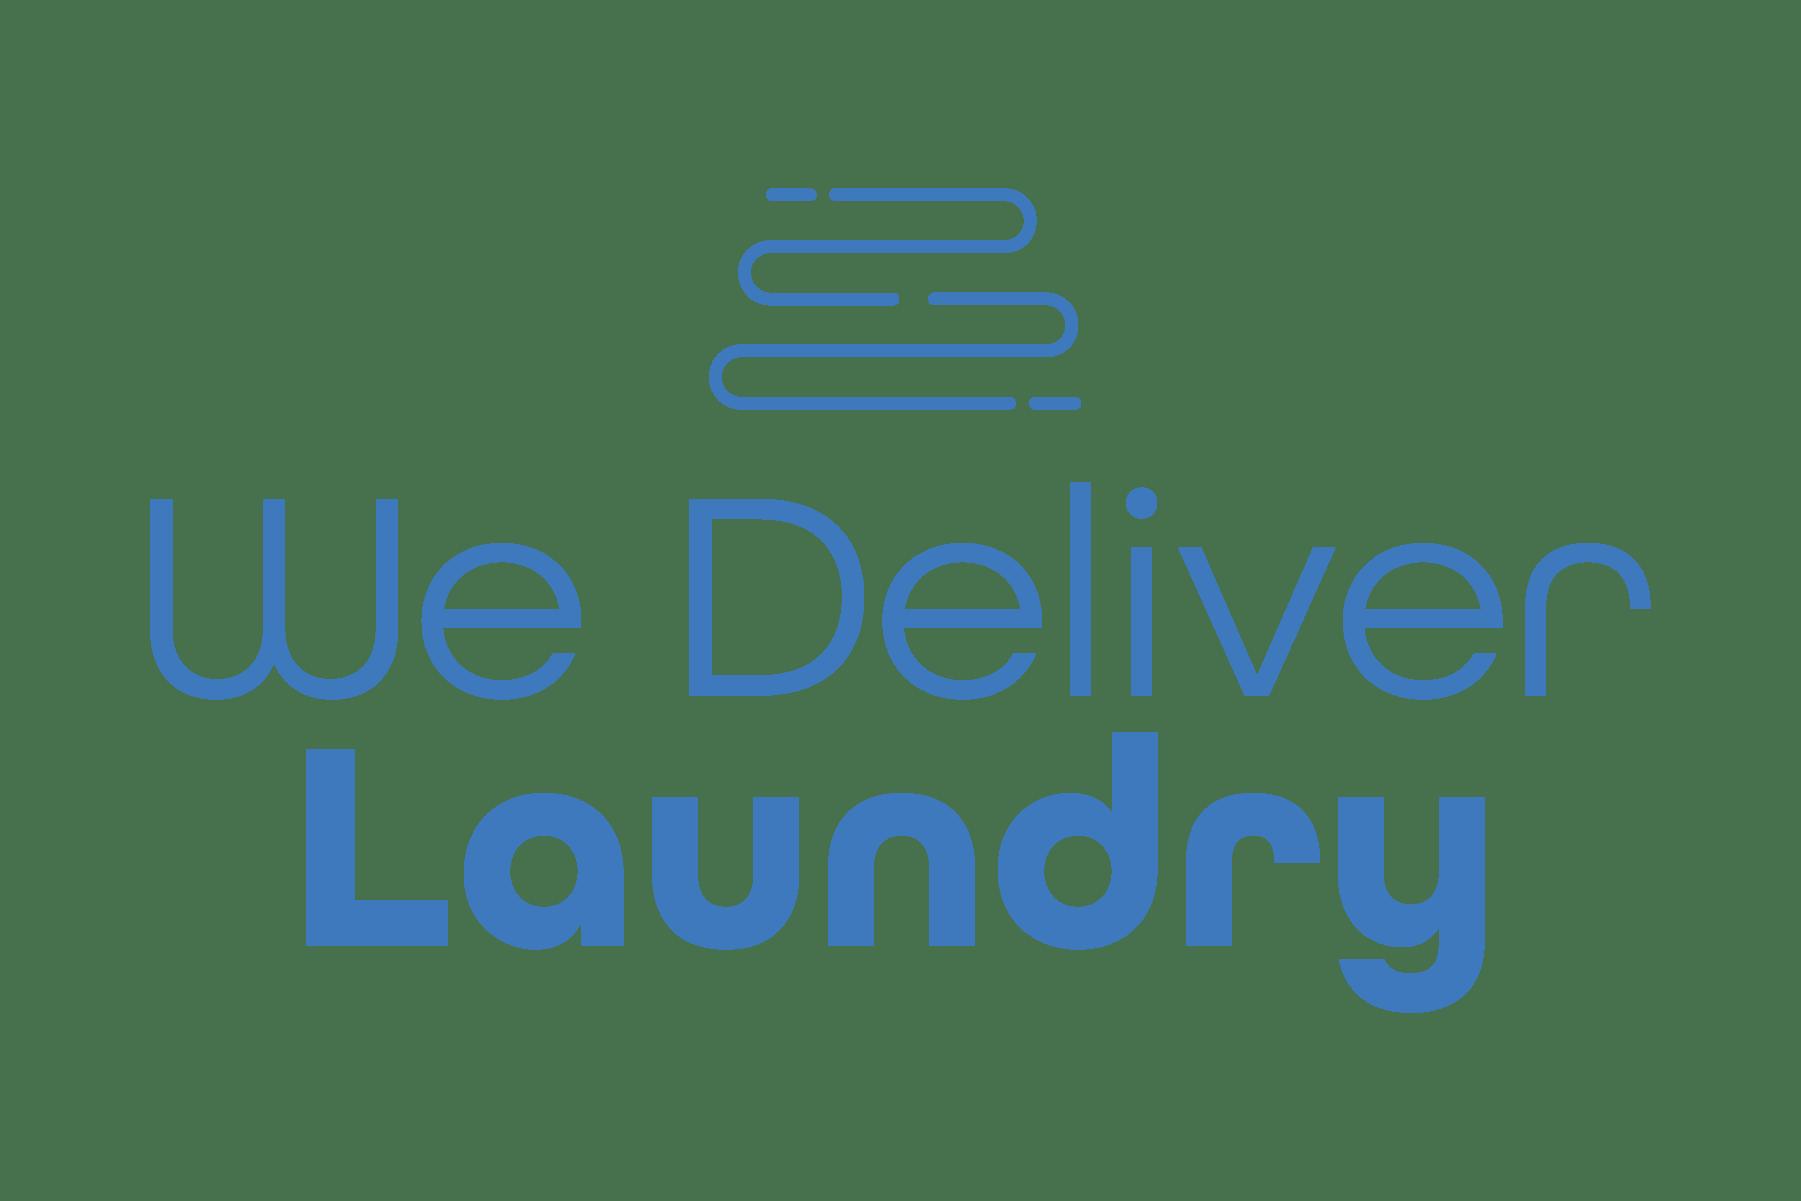 we deliver laundry service logo